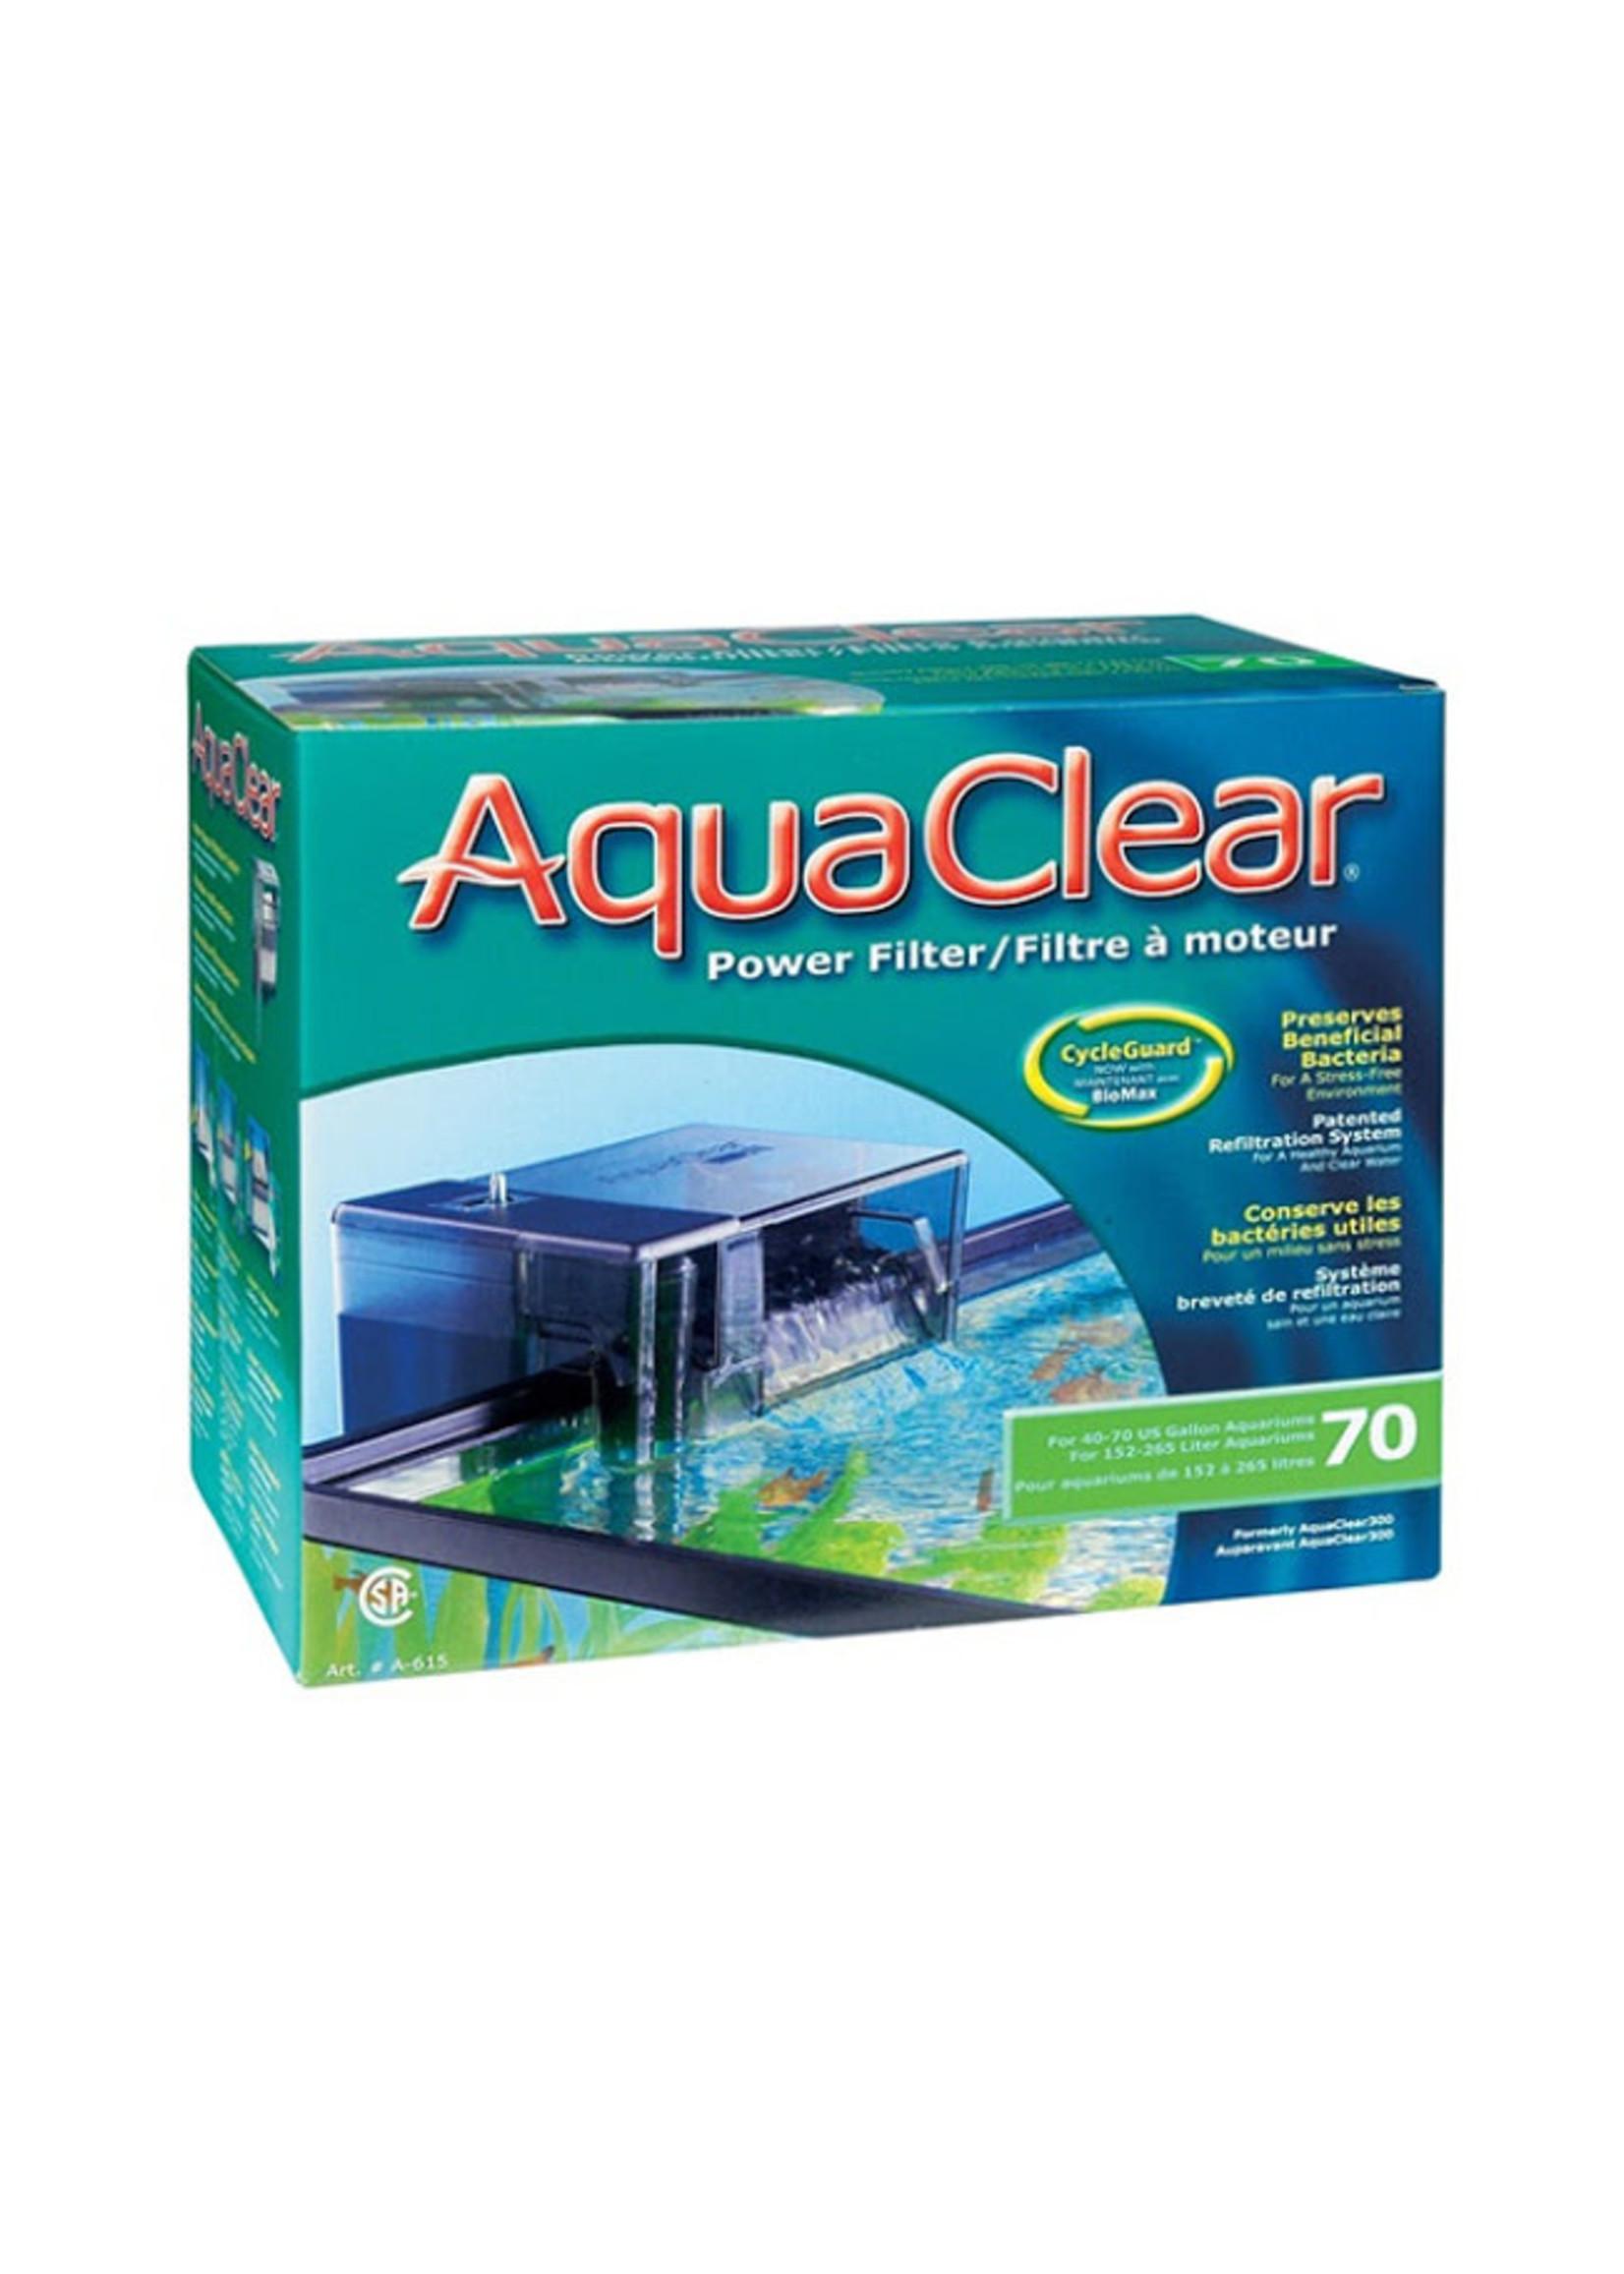 AquaClear AquaClear Power Filter 70